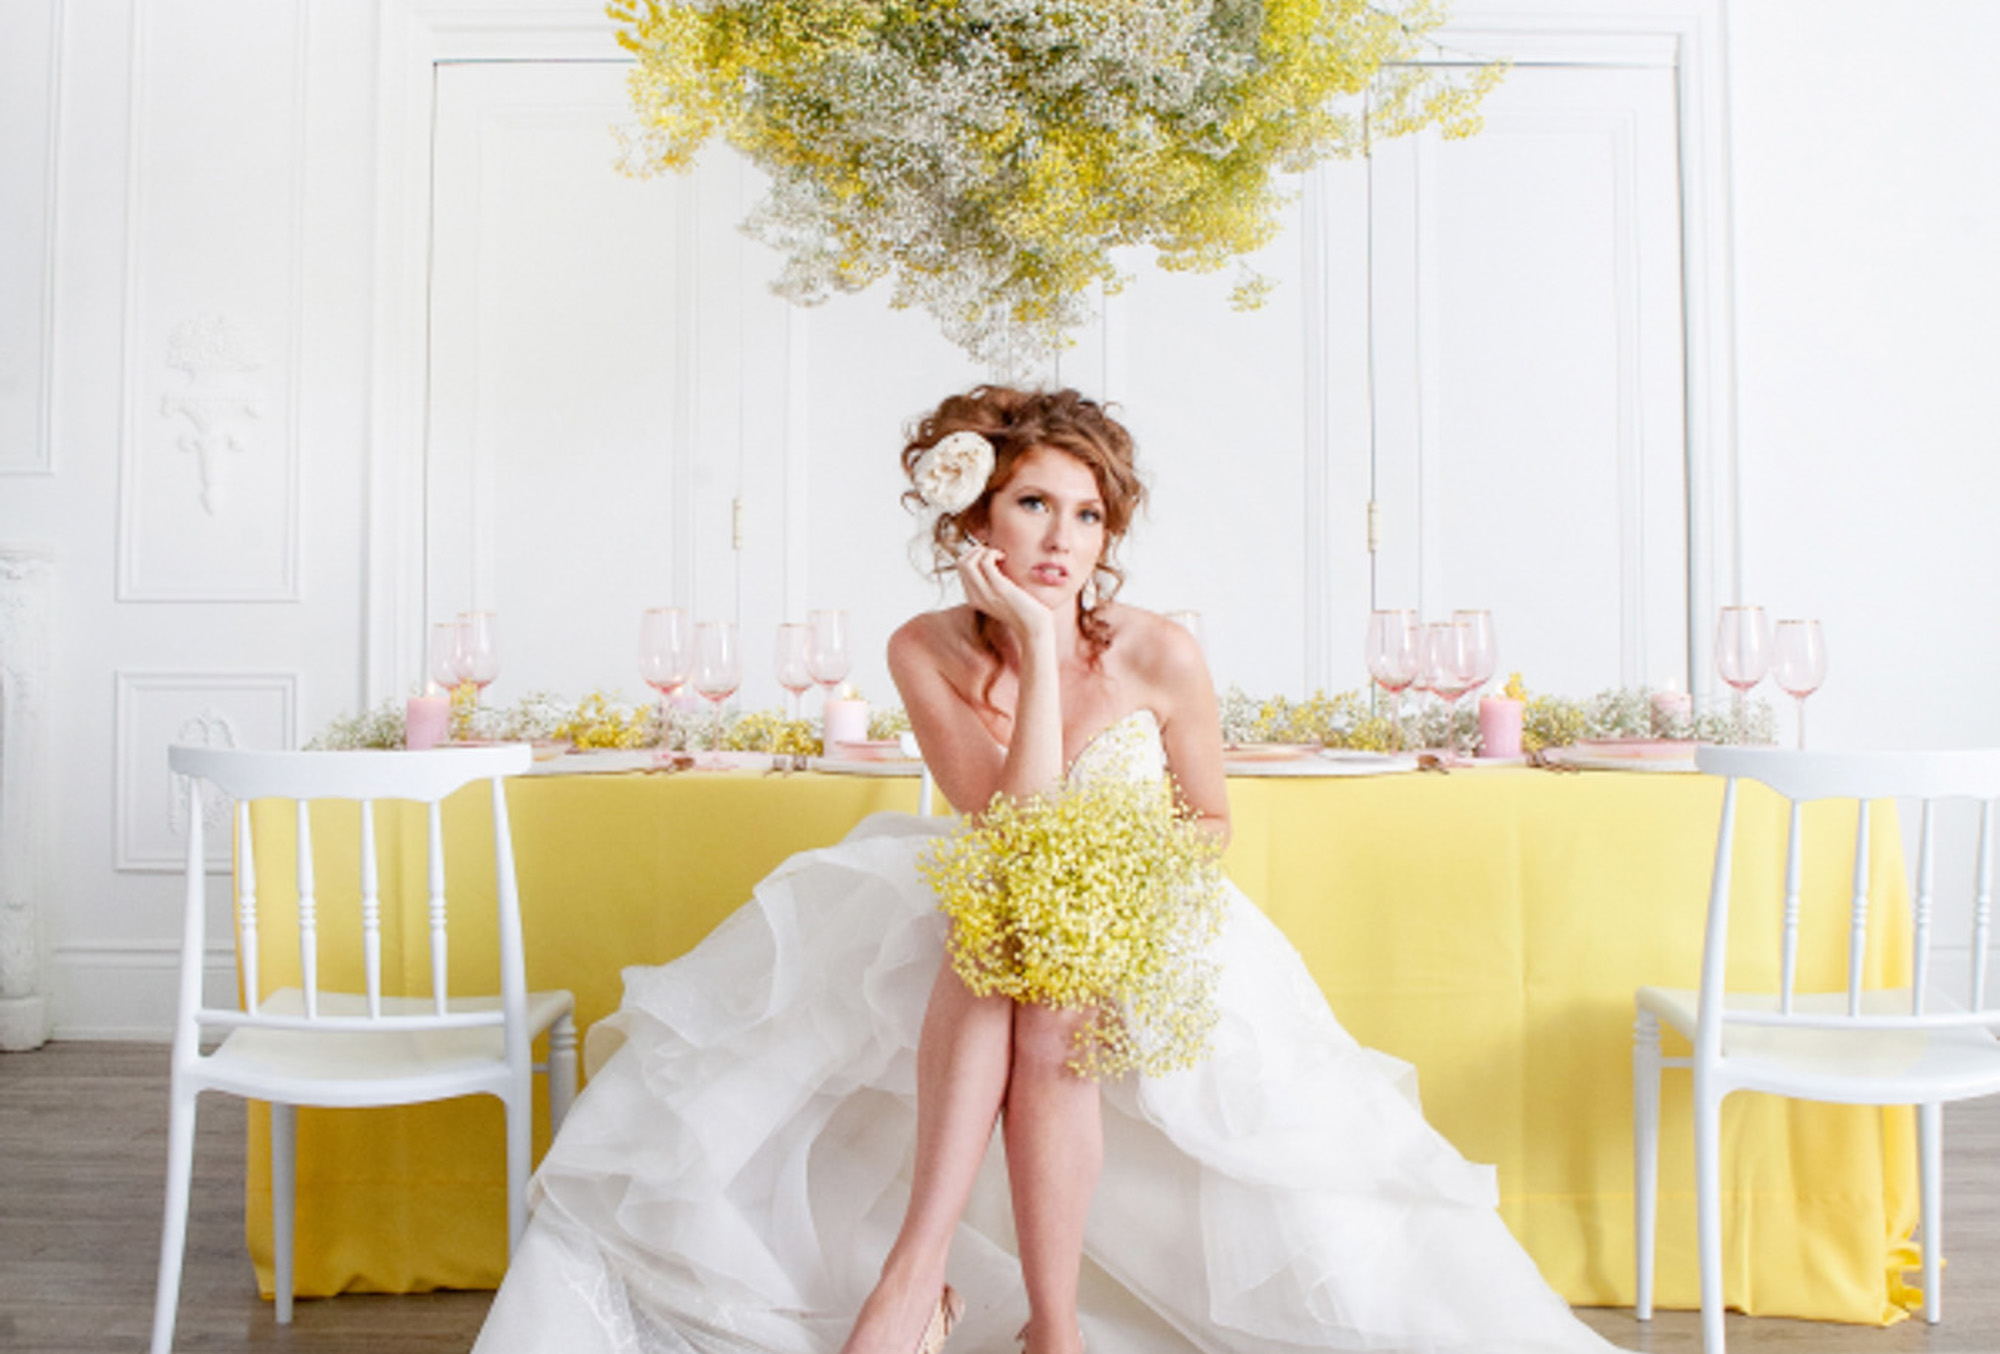 Bridal Editorial Photoshoot